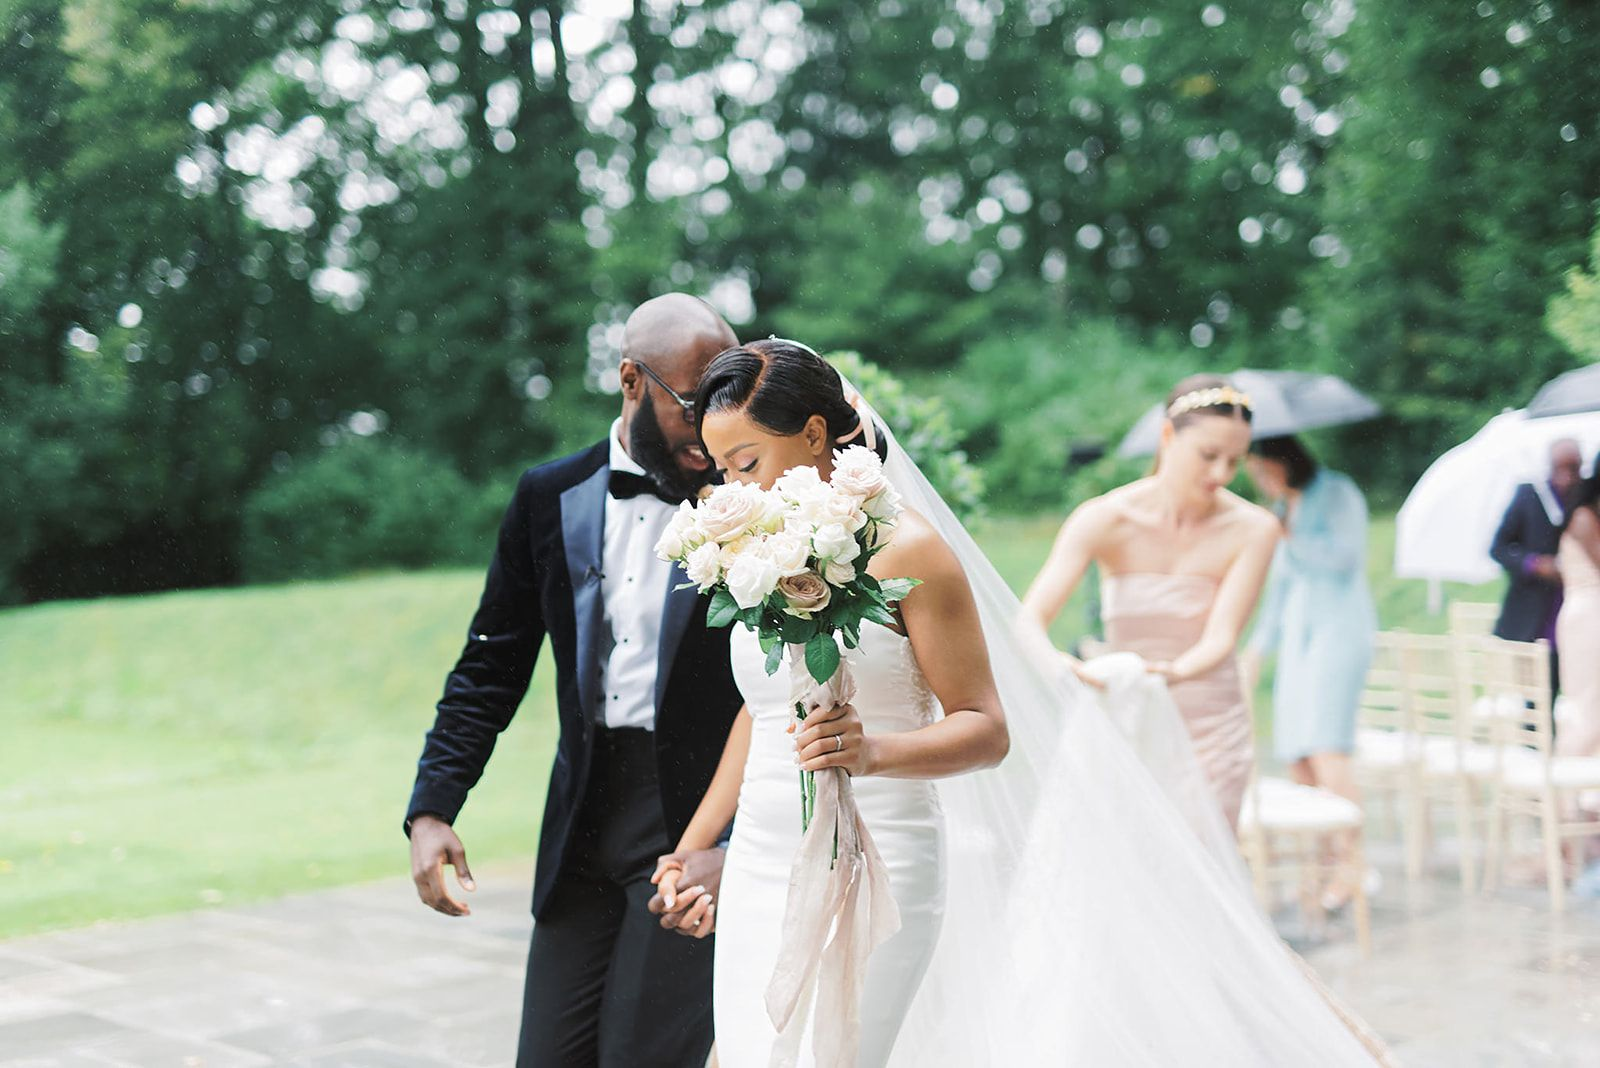 Bride and Groom in Black Tie For An Outdoor Wedding Ceremony In Devon